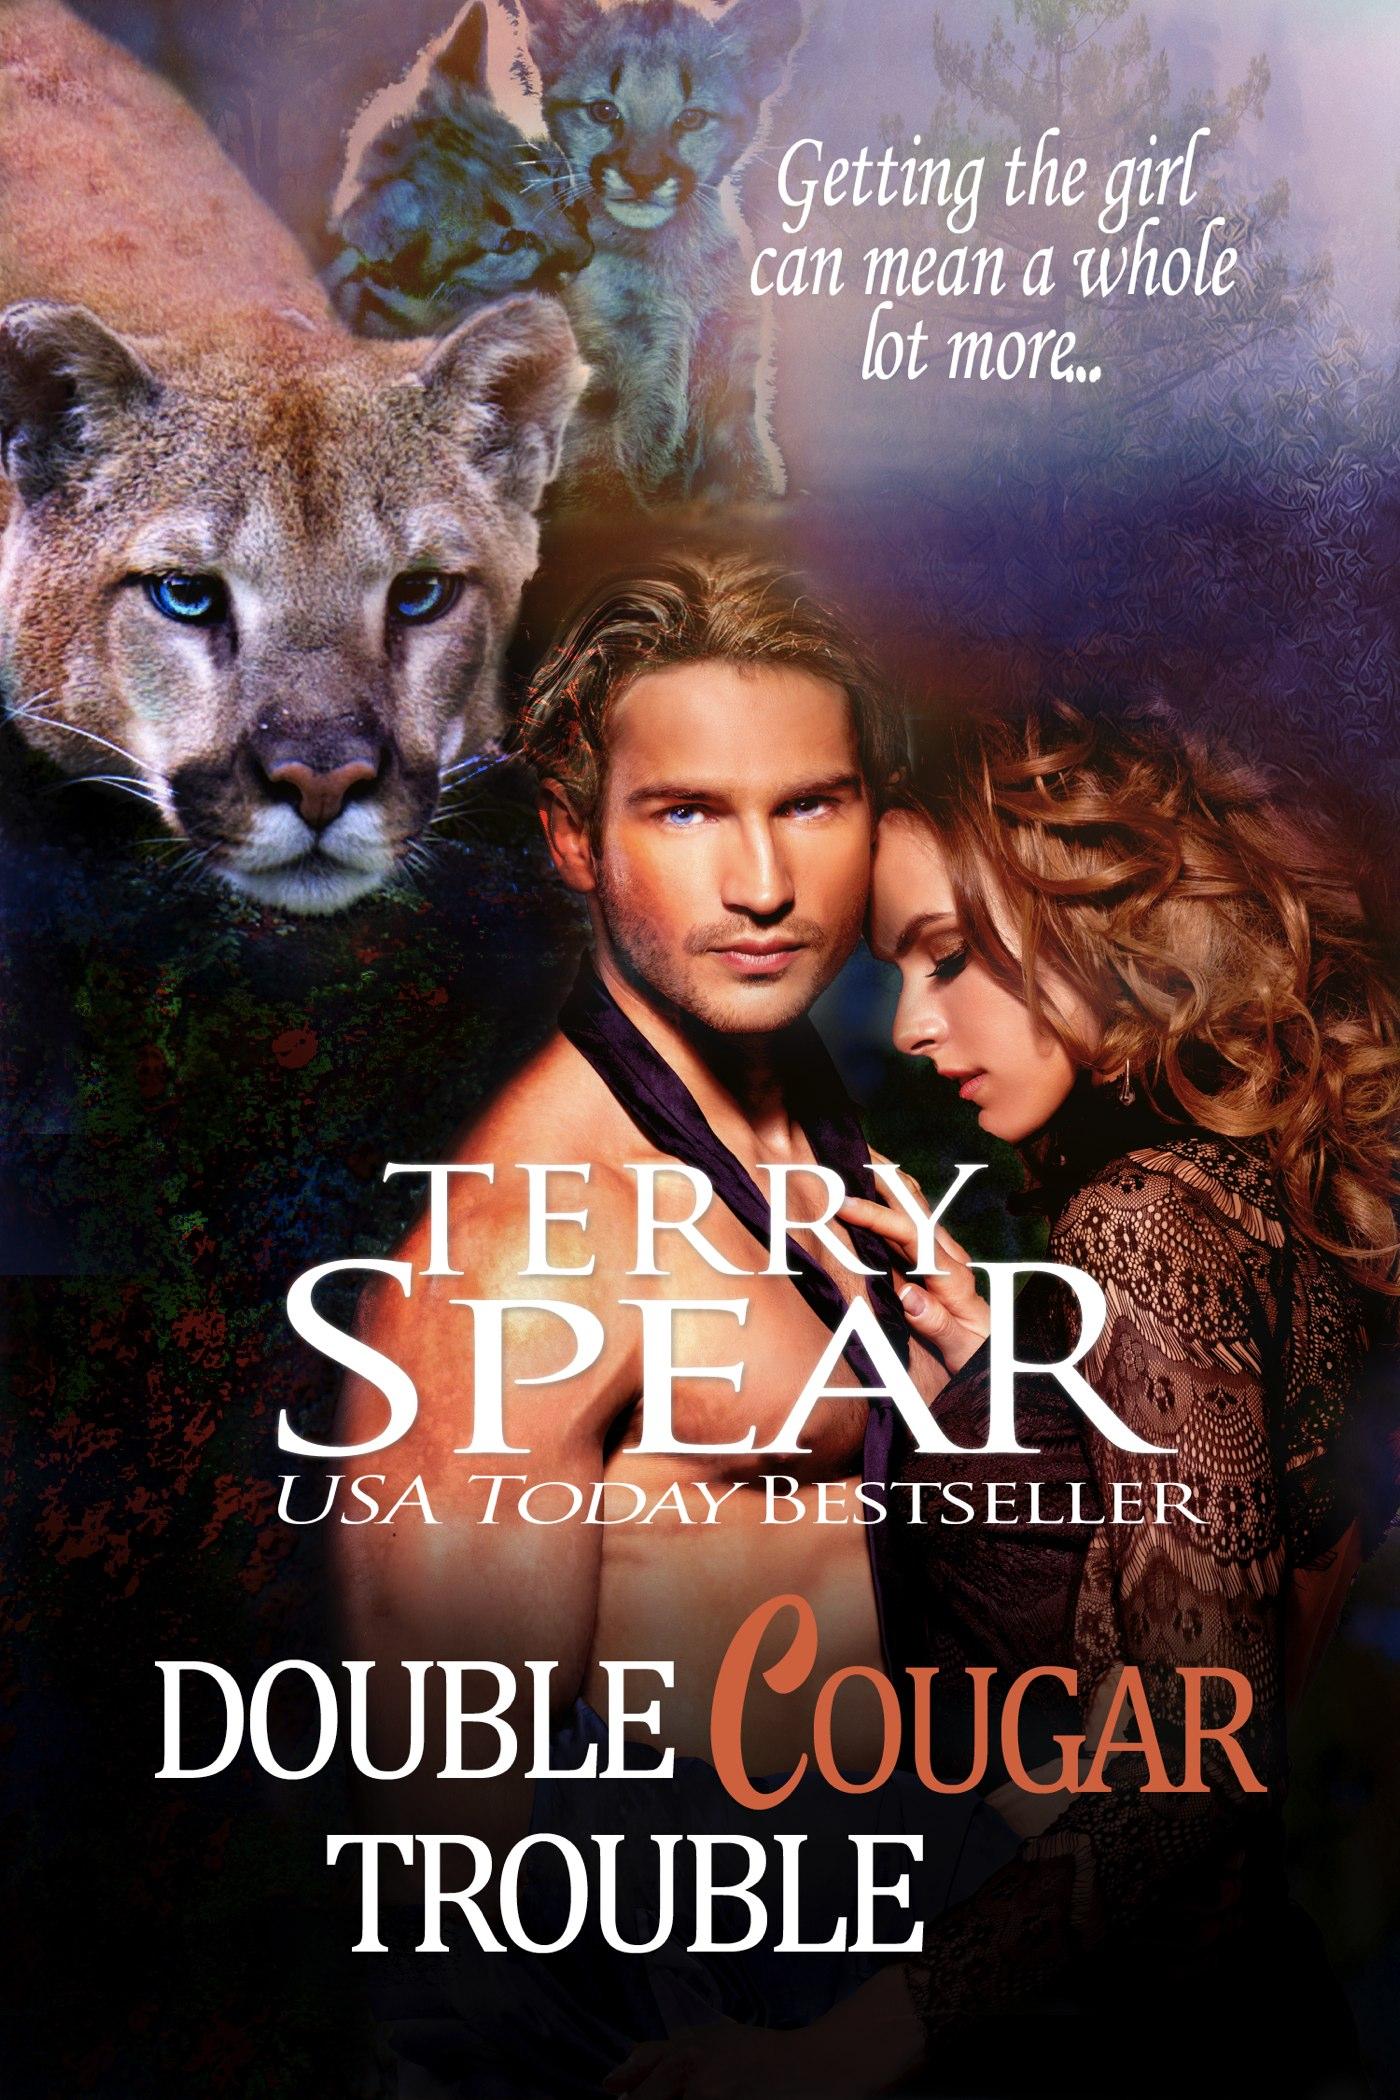 cougar full movie